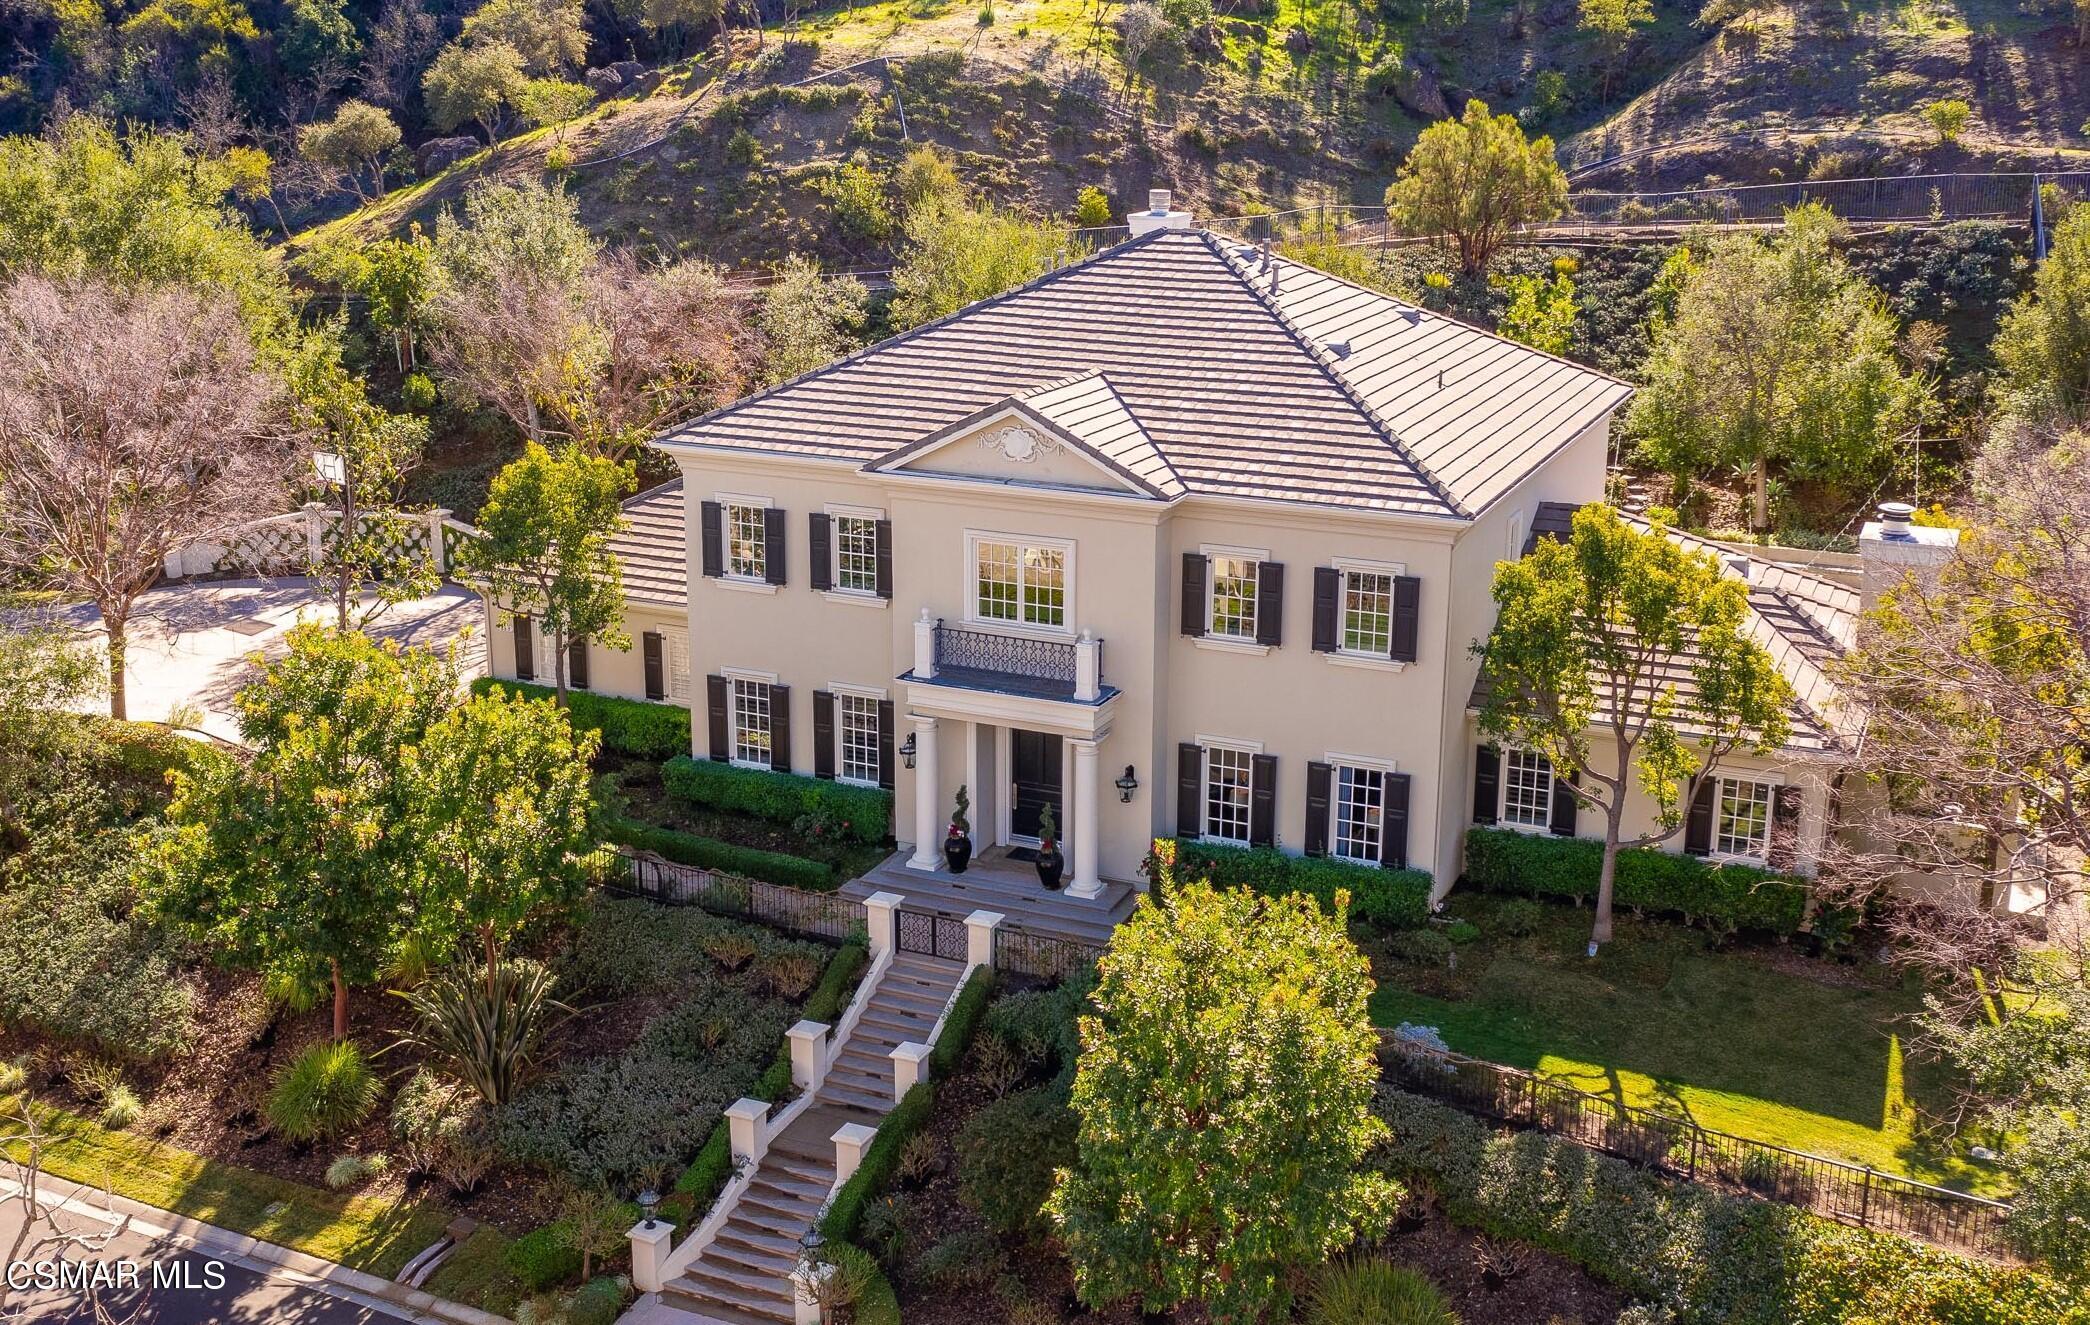 Photo of 863 W Stafford Road, Thousand Oaks, CA 91361